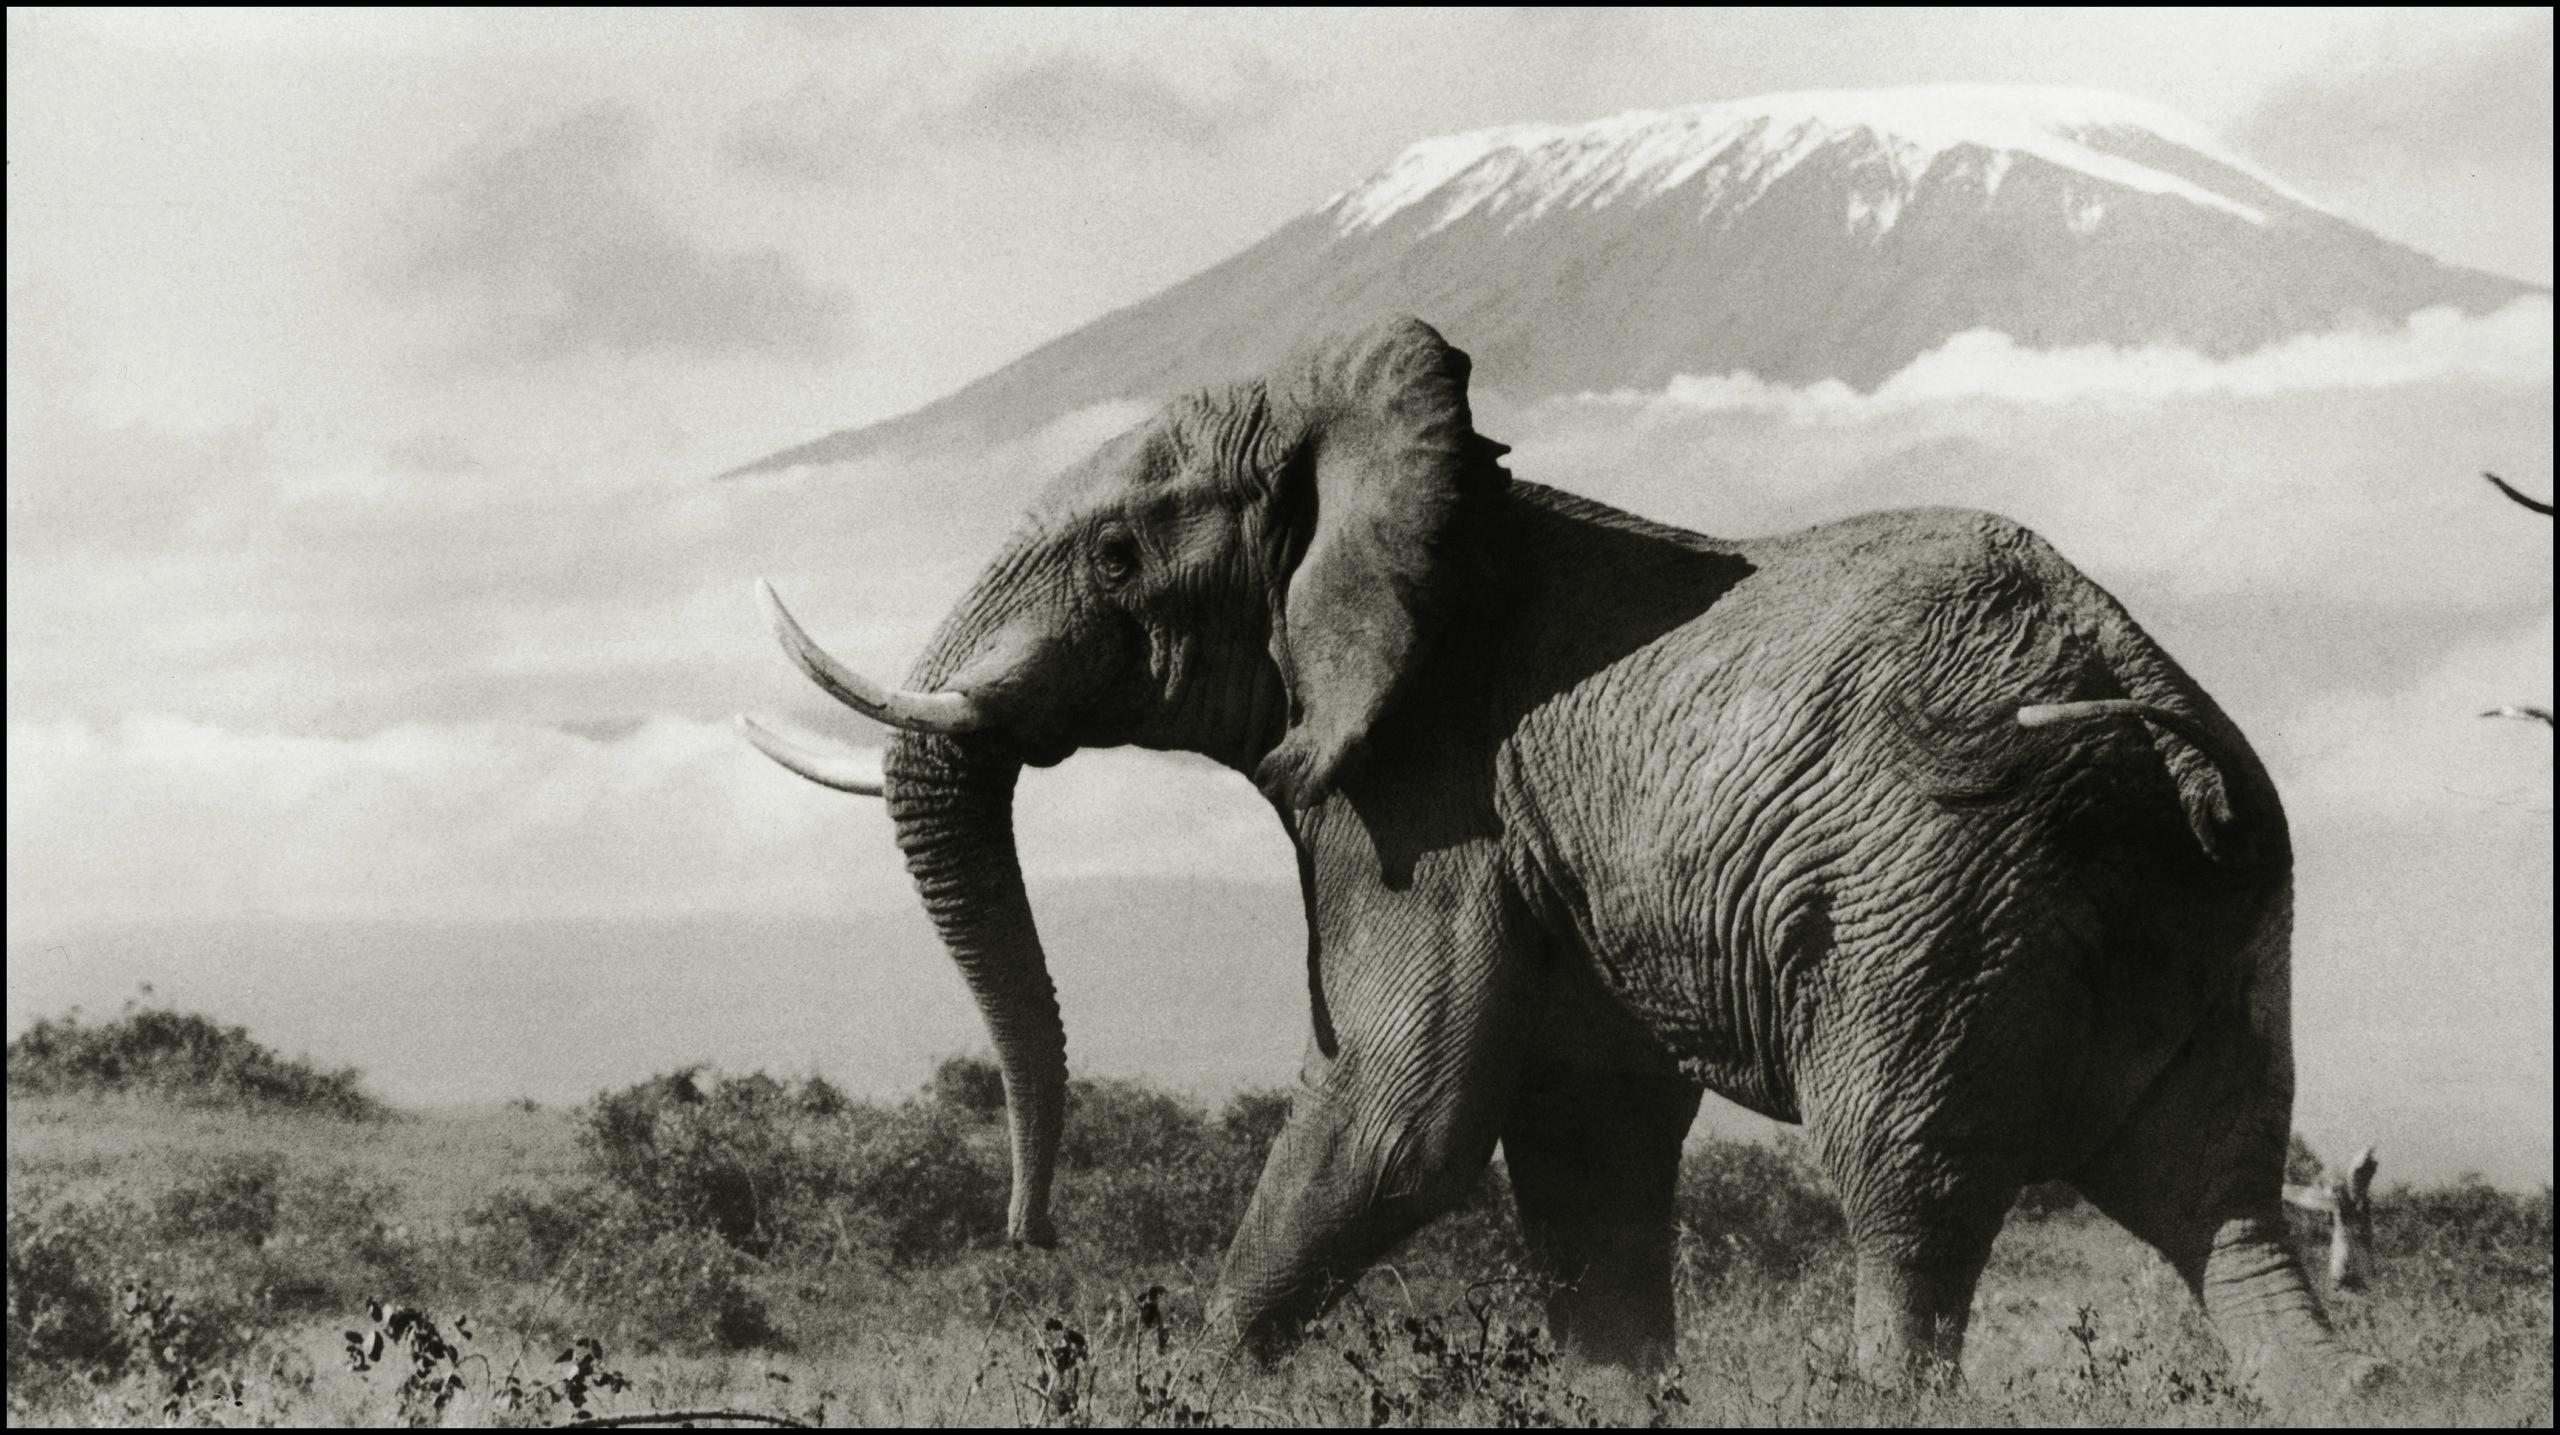 Snows of Kilimanjaro, 1972